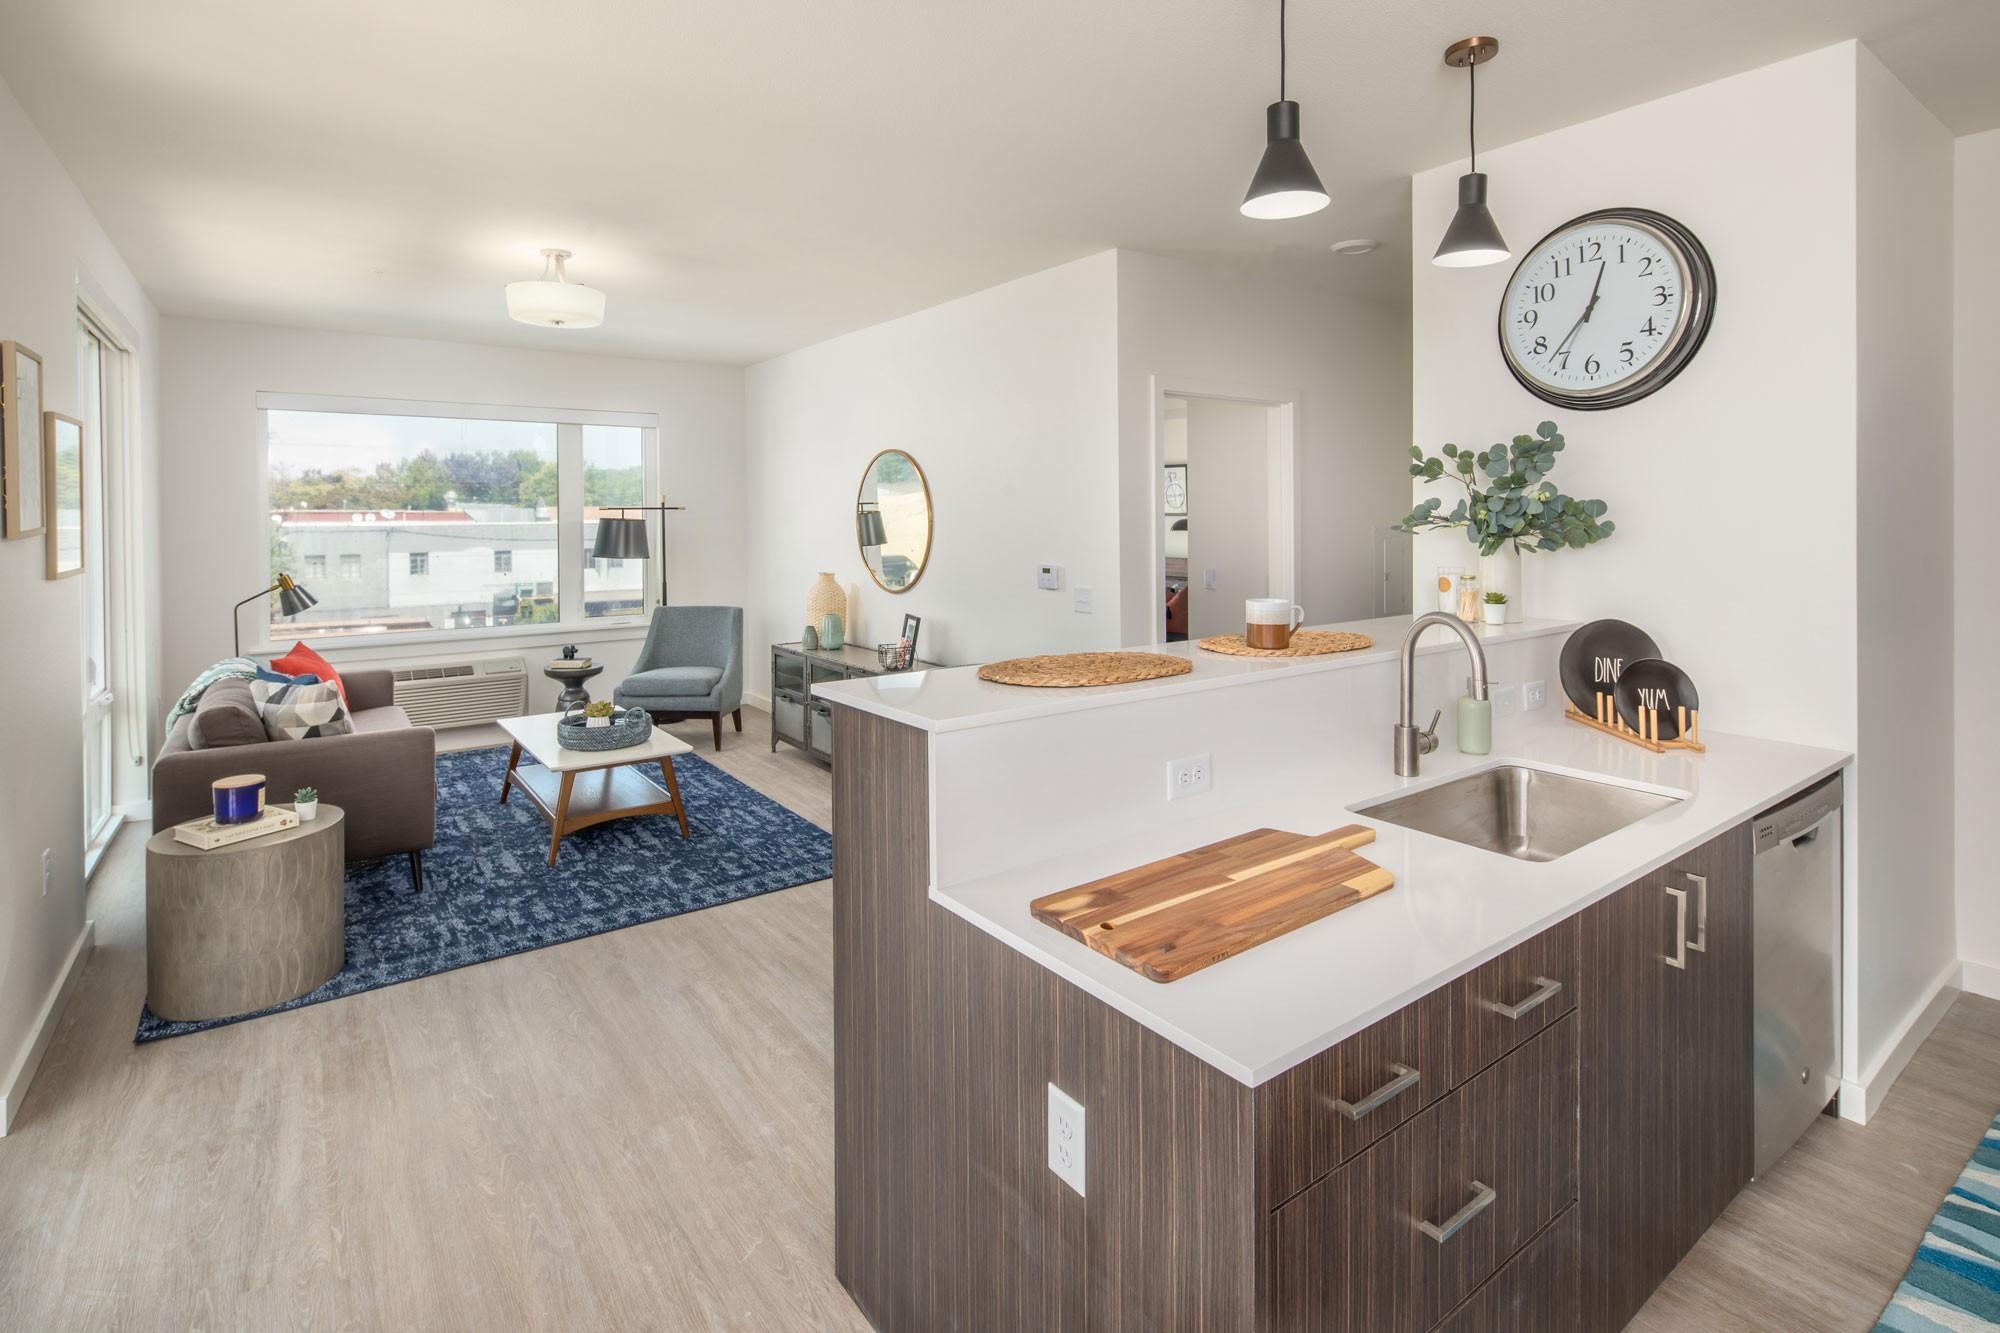 Apartments Near Marylhurst Axletree Apartments for Marylhurst University Students in Marylhurst, OR